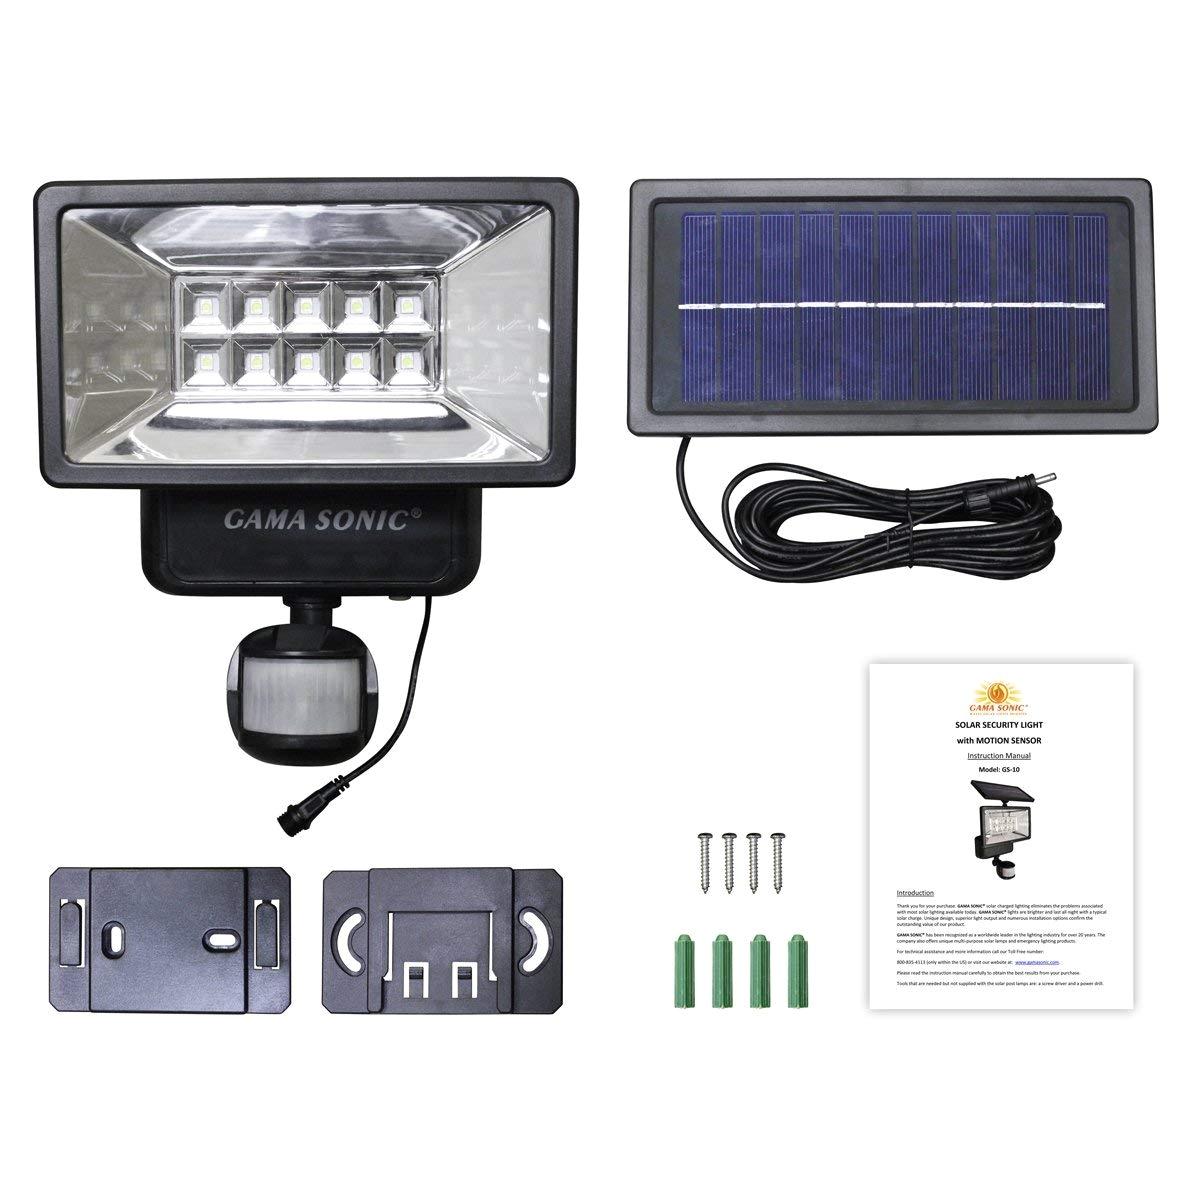 amazon com gama sonic solar outdoor security light with motion sensor gs 10 black finish garden outdoor